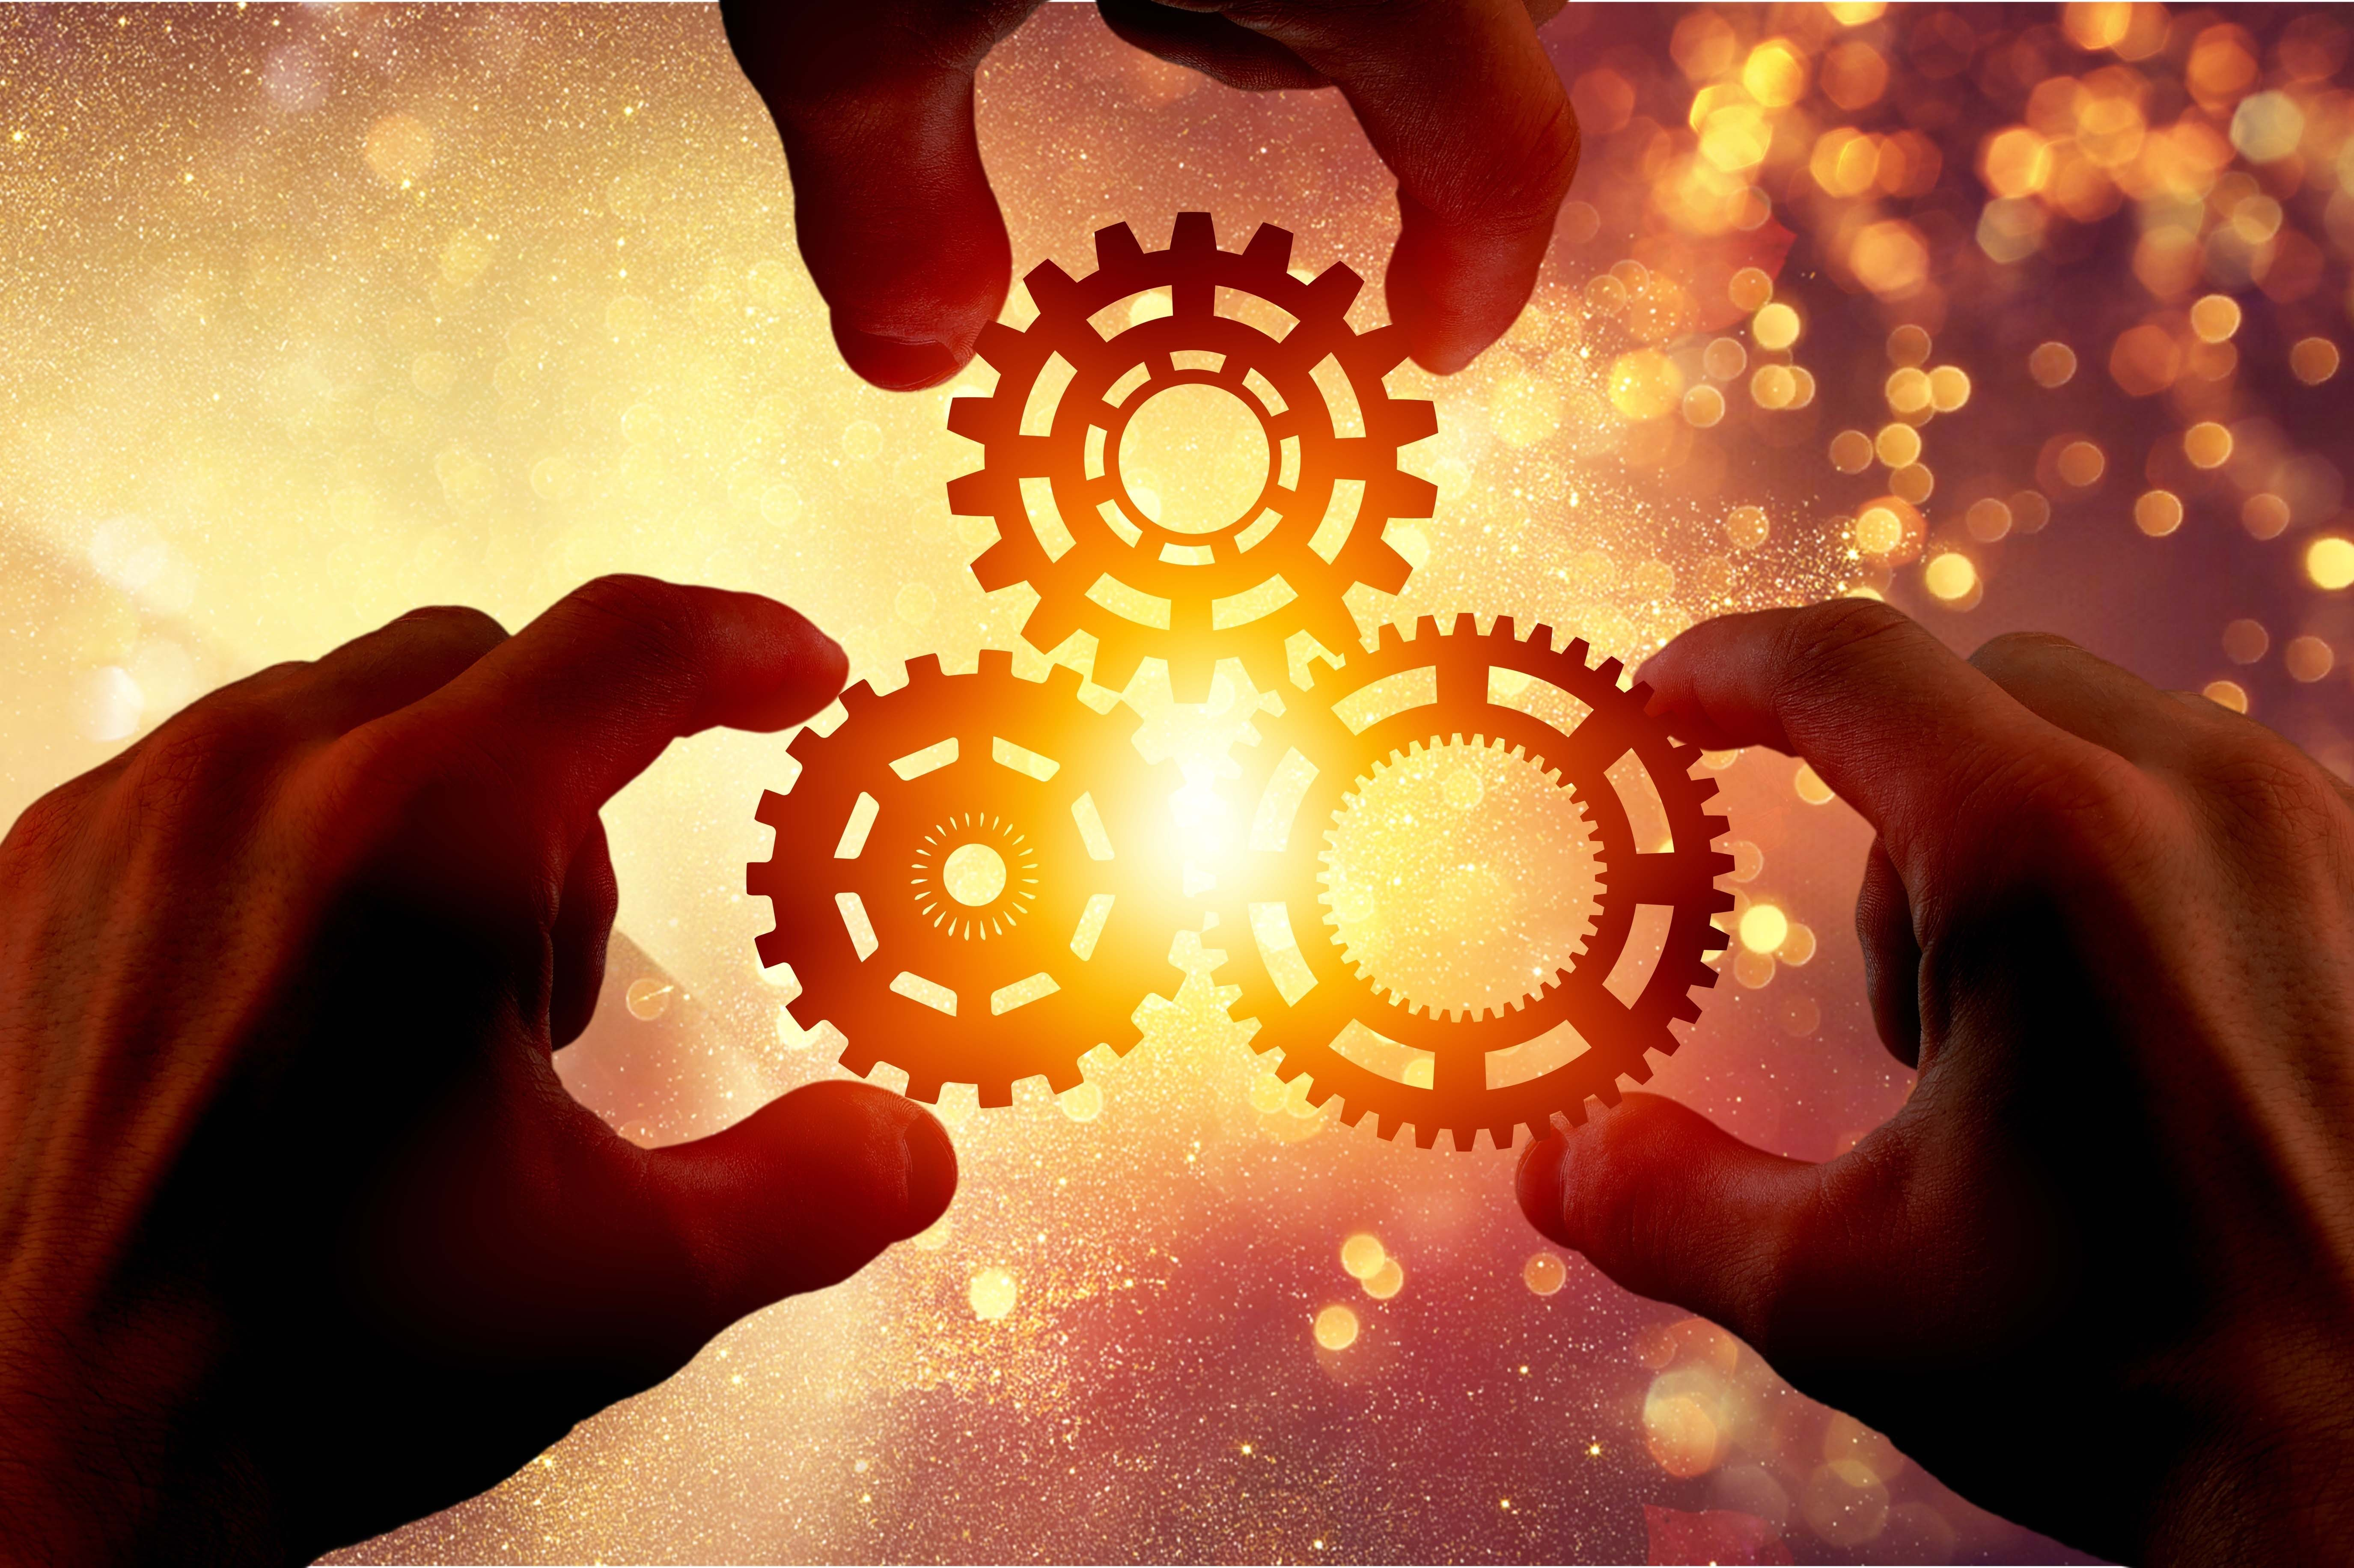 Inventors,, innovators, and entrepreneurs all work together for tech transfer